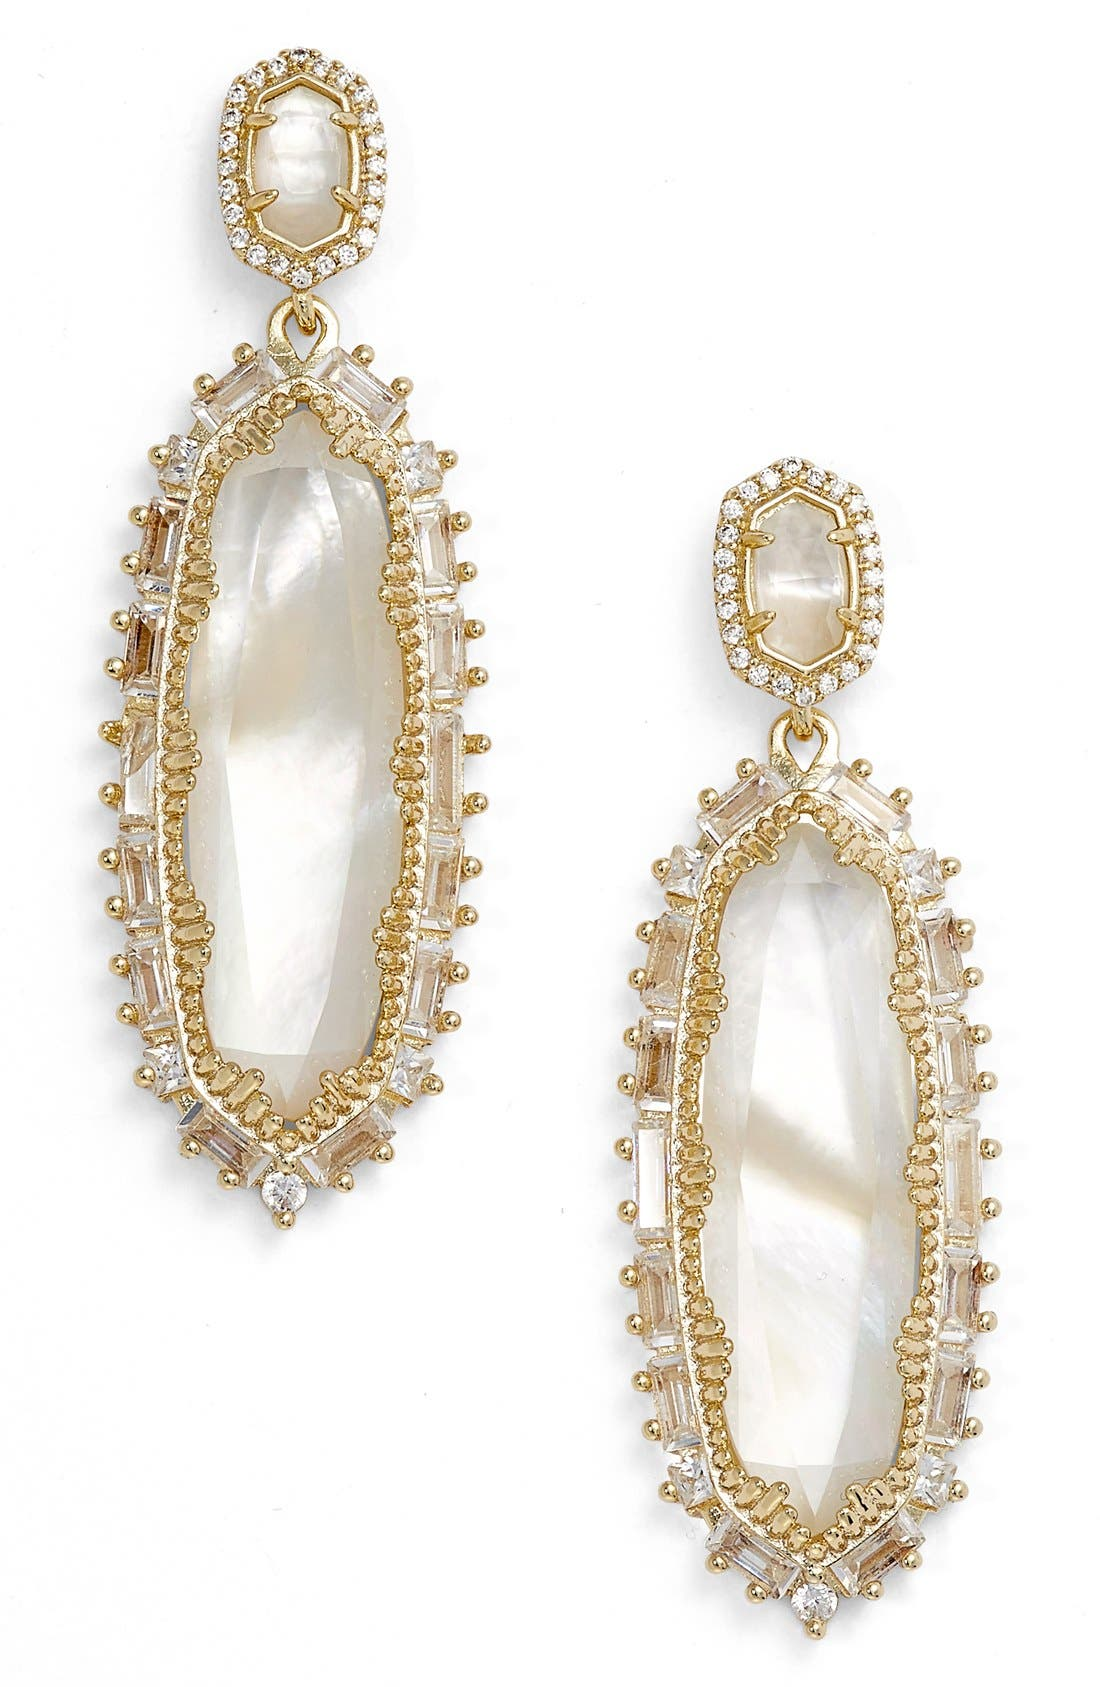 KENDRA SCOTT 'Kalina' Drop Earrings